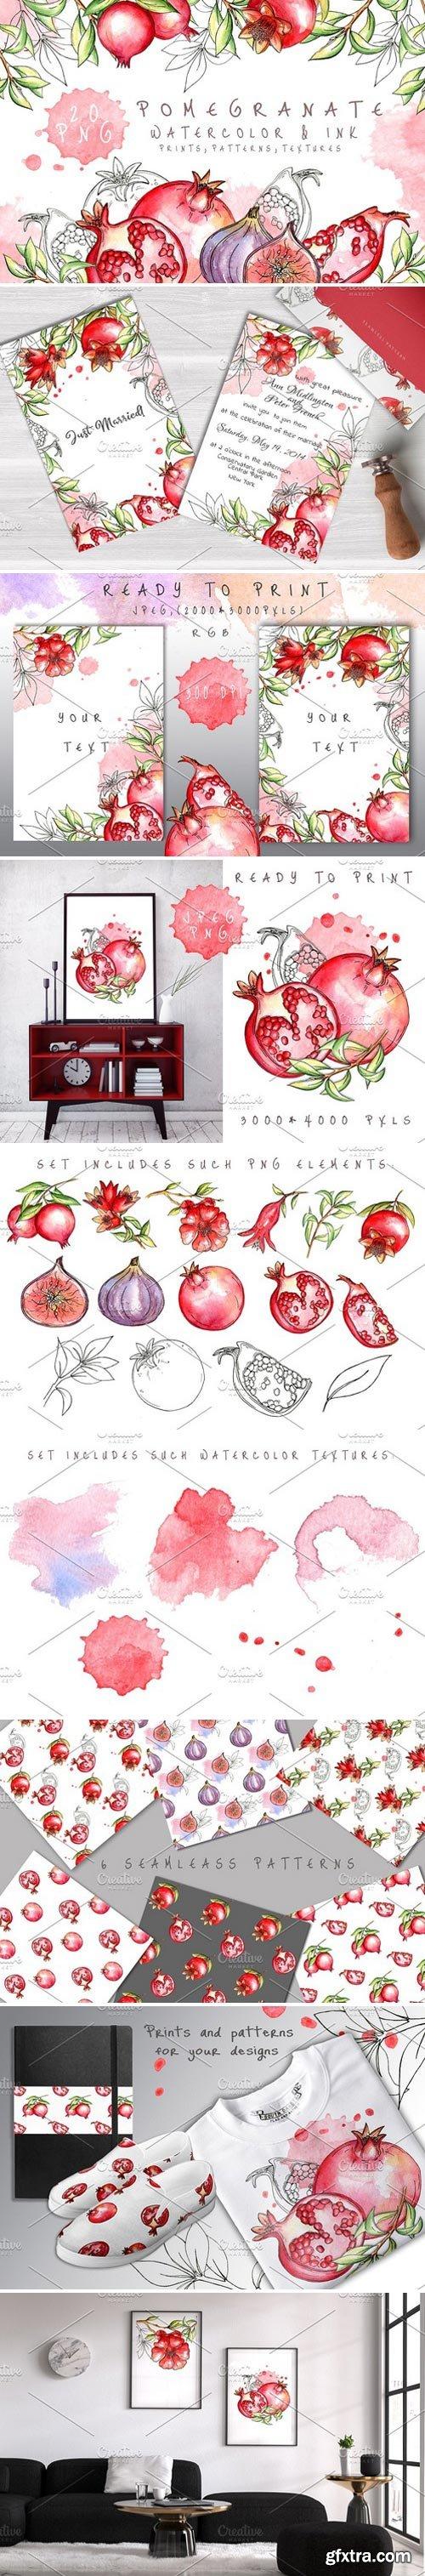 CM - Juicy pomegranate 2339697